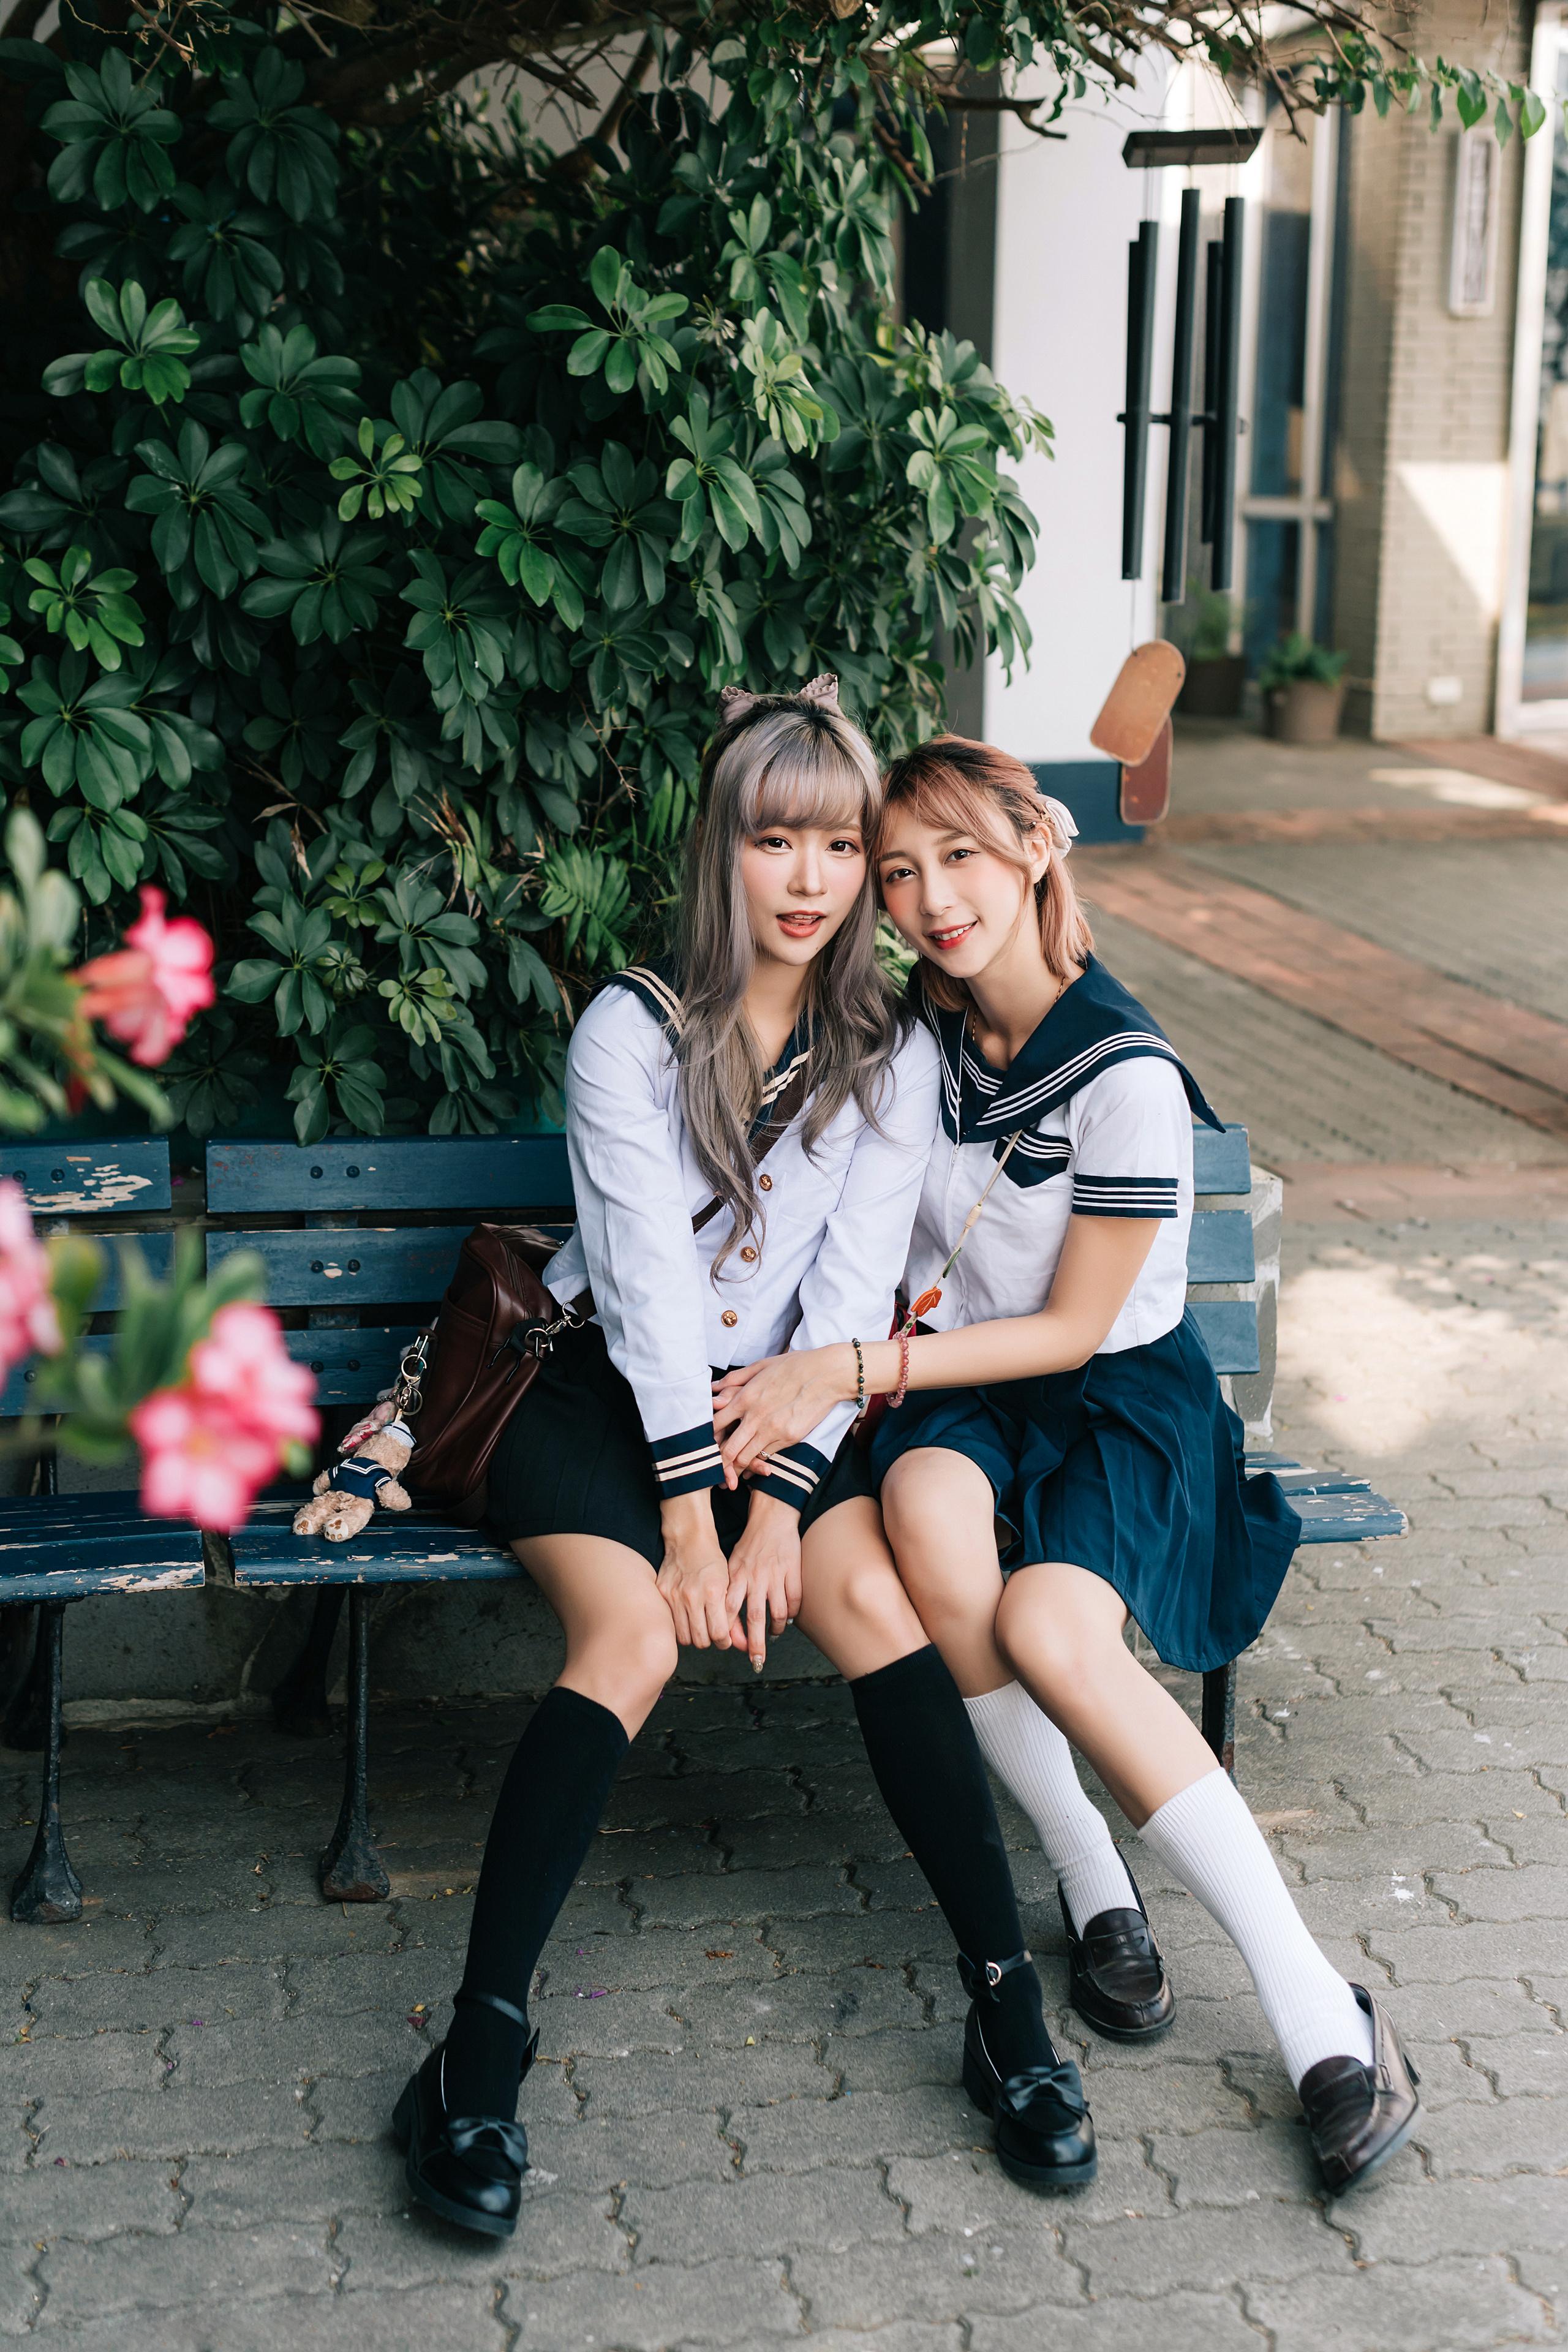 Asian Model Women Women Outdoors Dark Hair Long Hair Sitting Bench School Uniform Sailor Uniform Hai 2560x3840